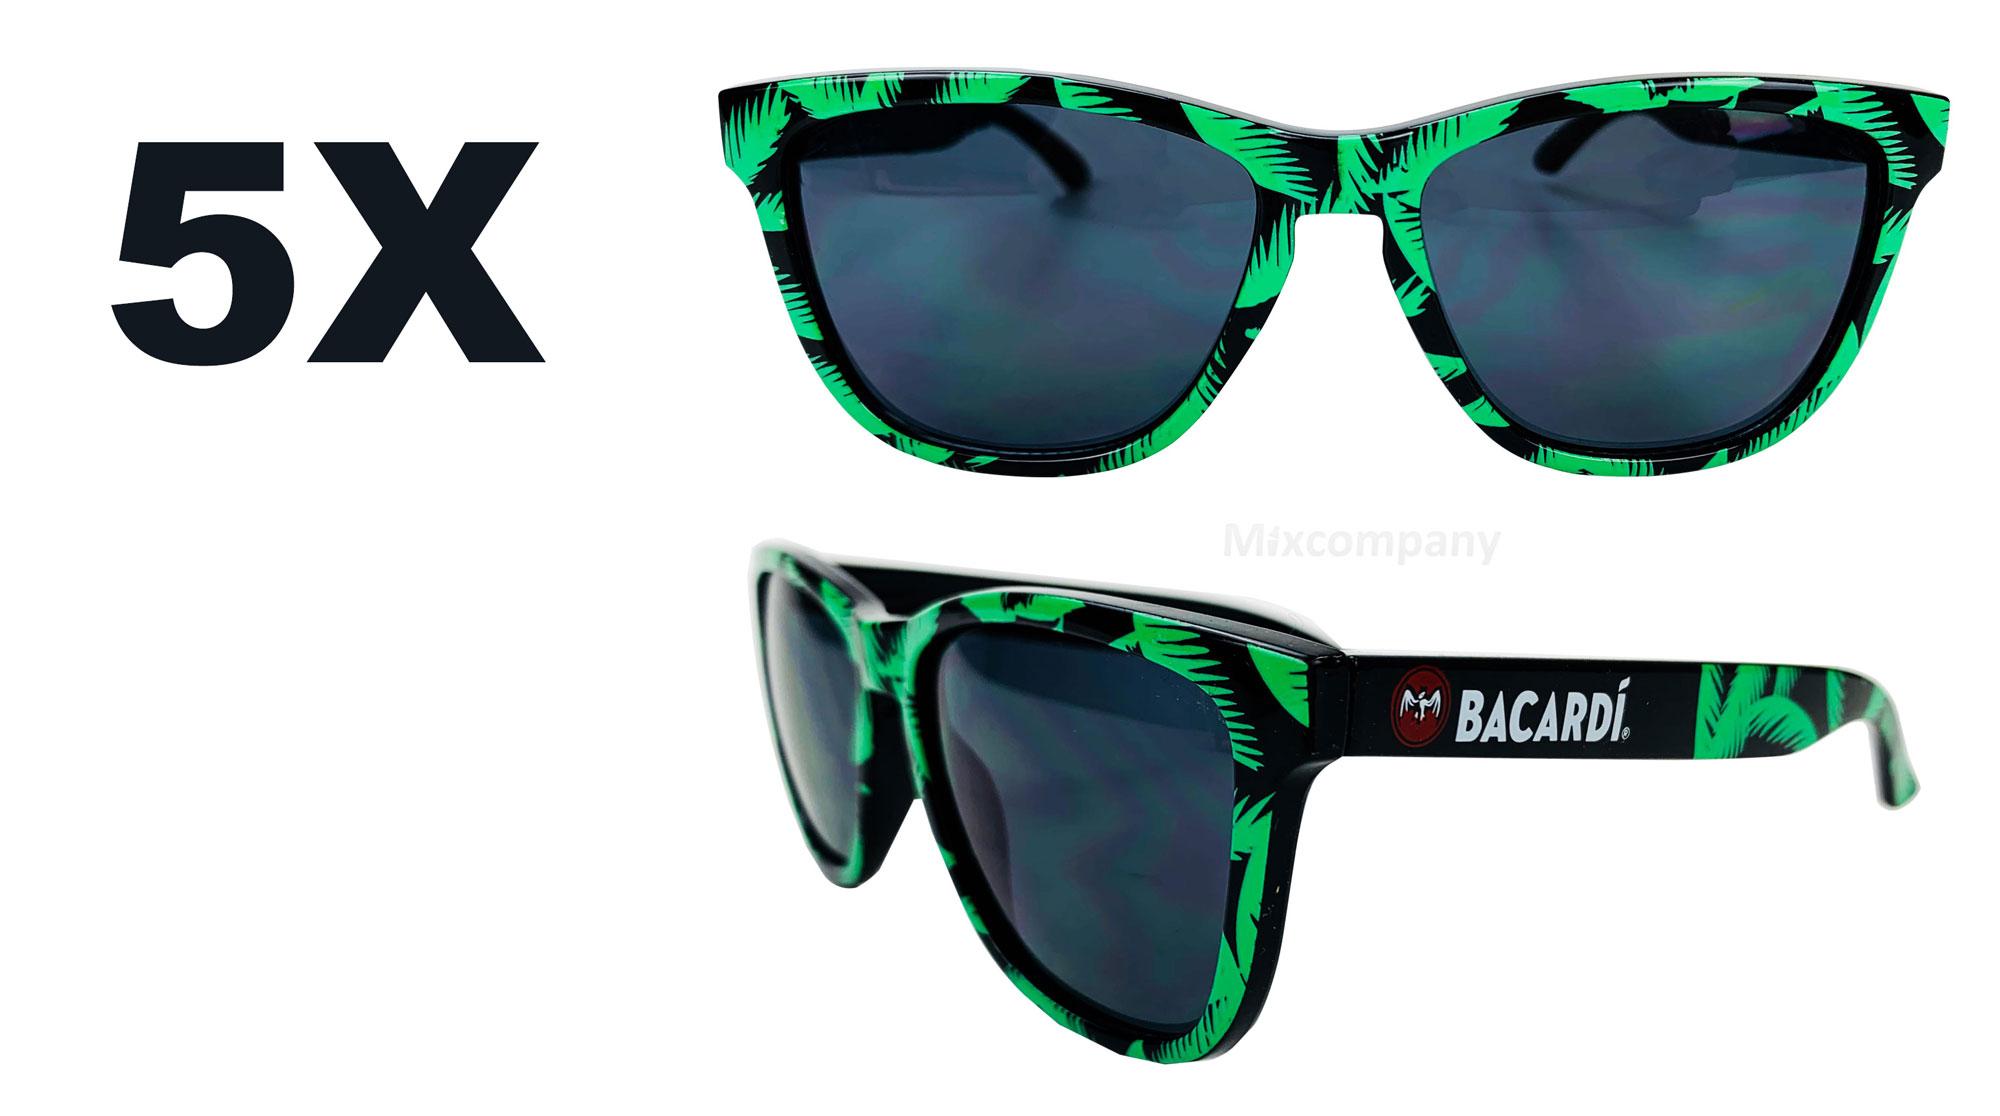 Bacardi Rum Nerd Sonnenbrille mit Palmenmuster grün UV400 Set - 5 Stück Unisex Retro Vintage Style Party Festival Bar